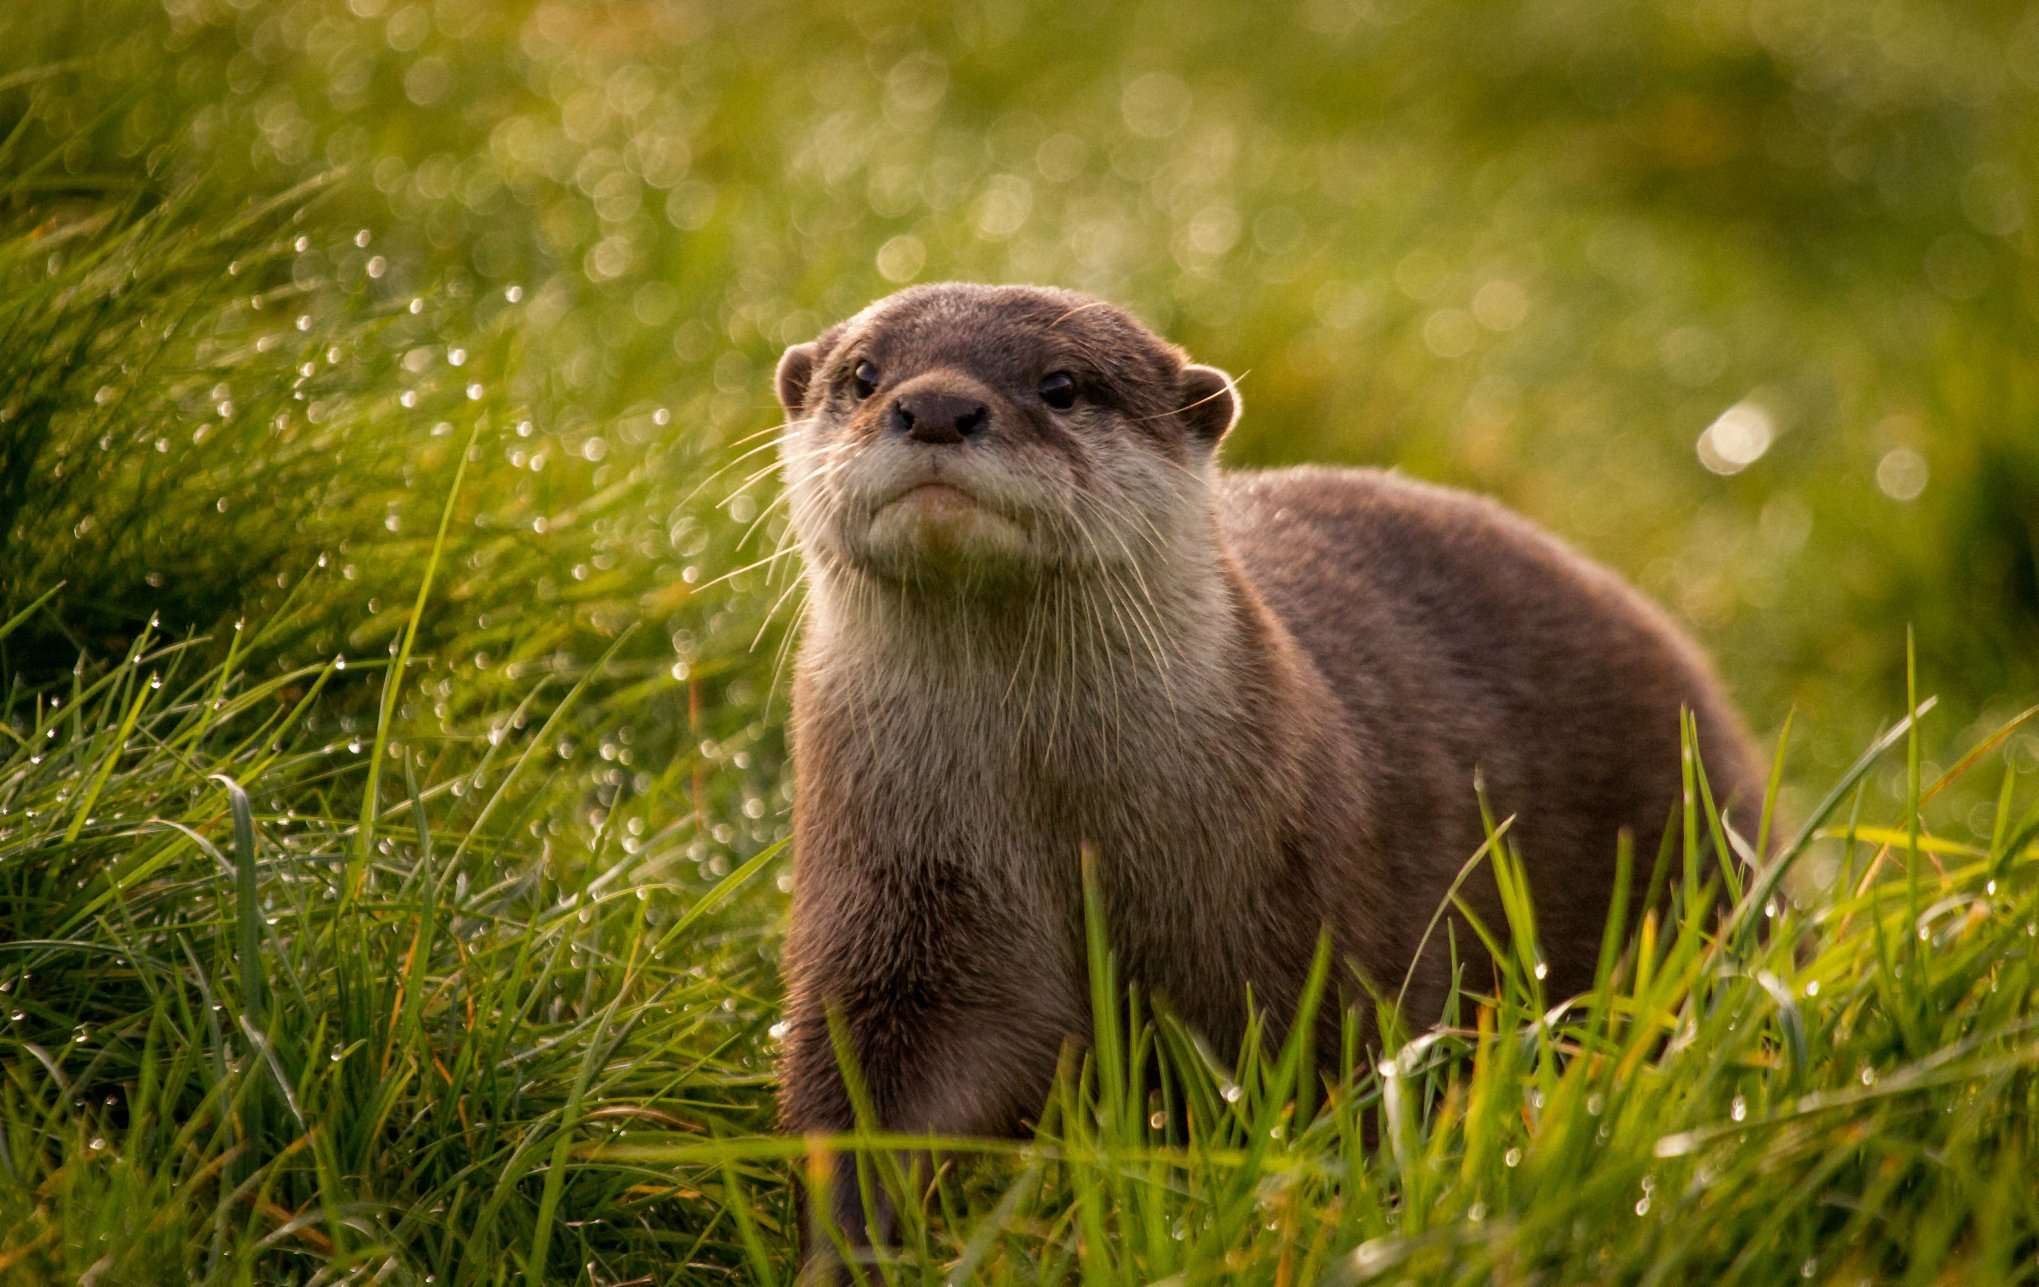 Cute River Otters   wallpaper 2039x1287